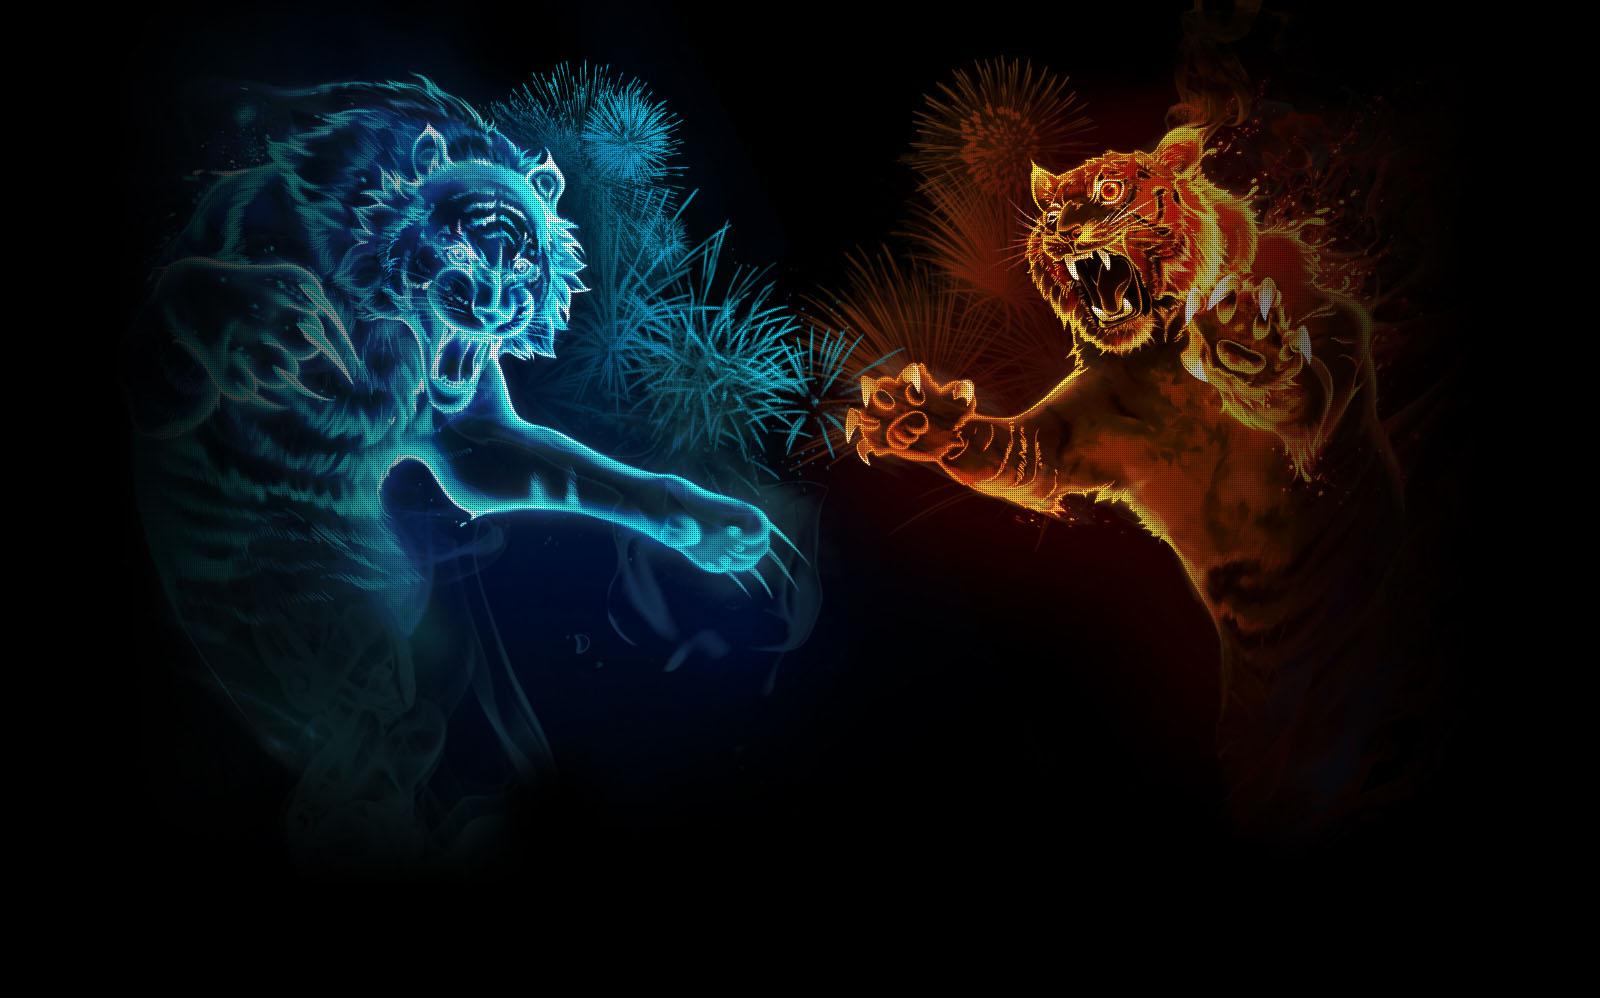 72 Cool Tiger Backgrounds On Wallpapersafari